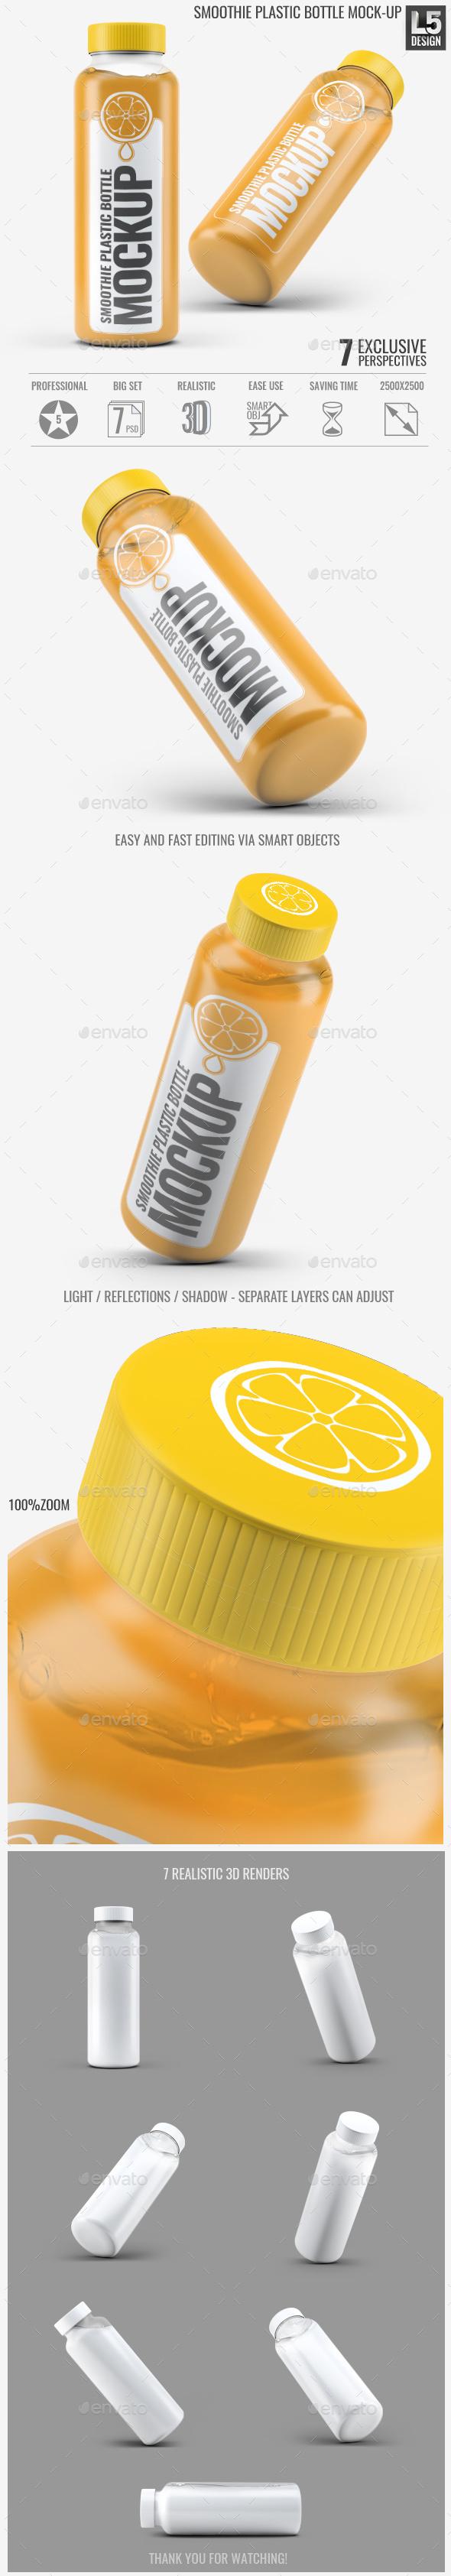 Smoothie Plastic Bottle Mock-Up - Food and Drink Packaging